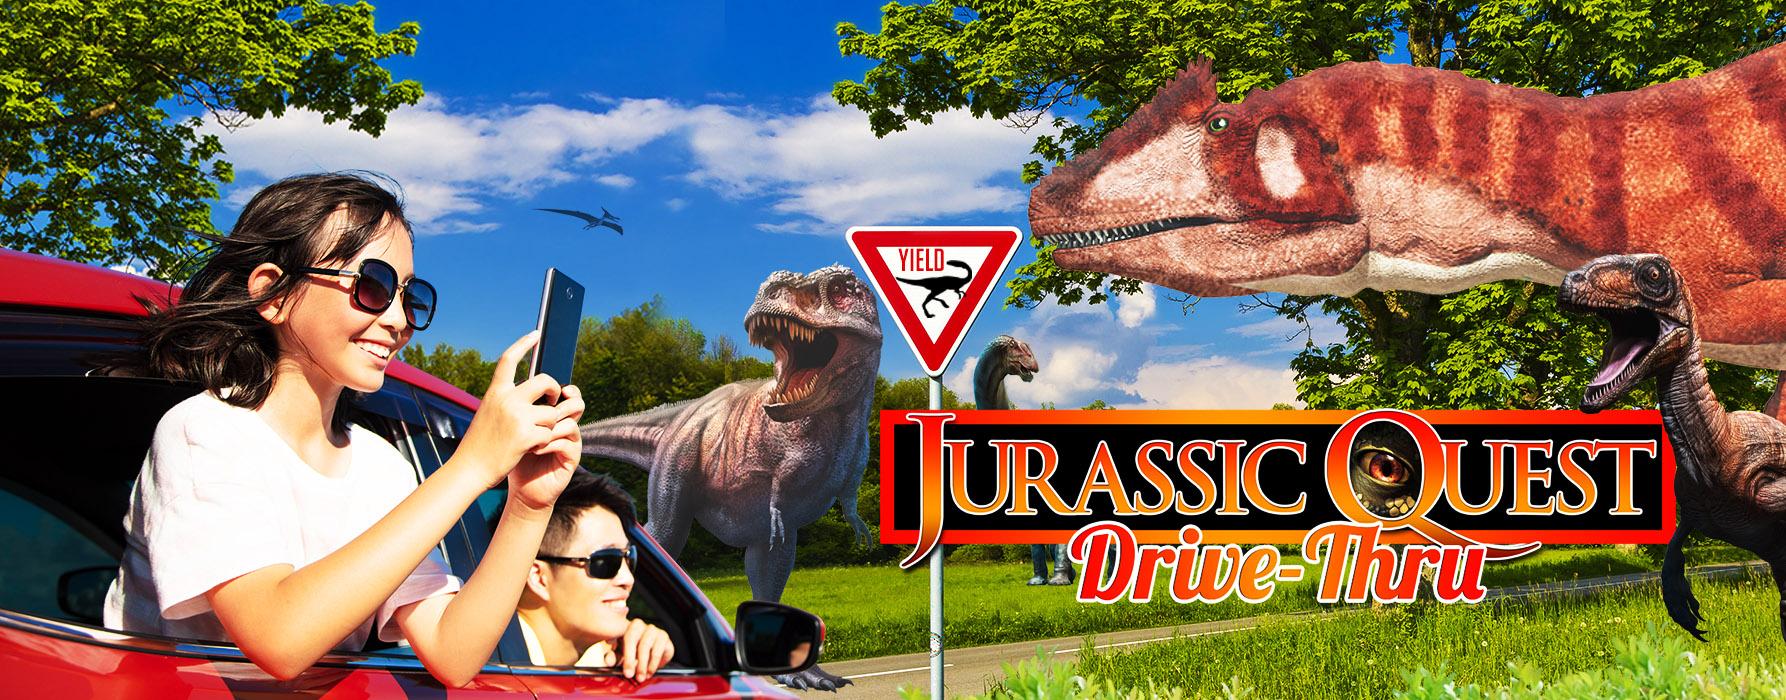 Jurassic Quest Drive-Thru car